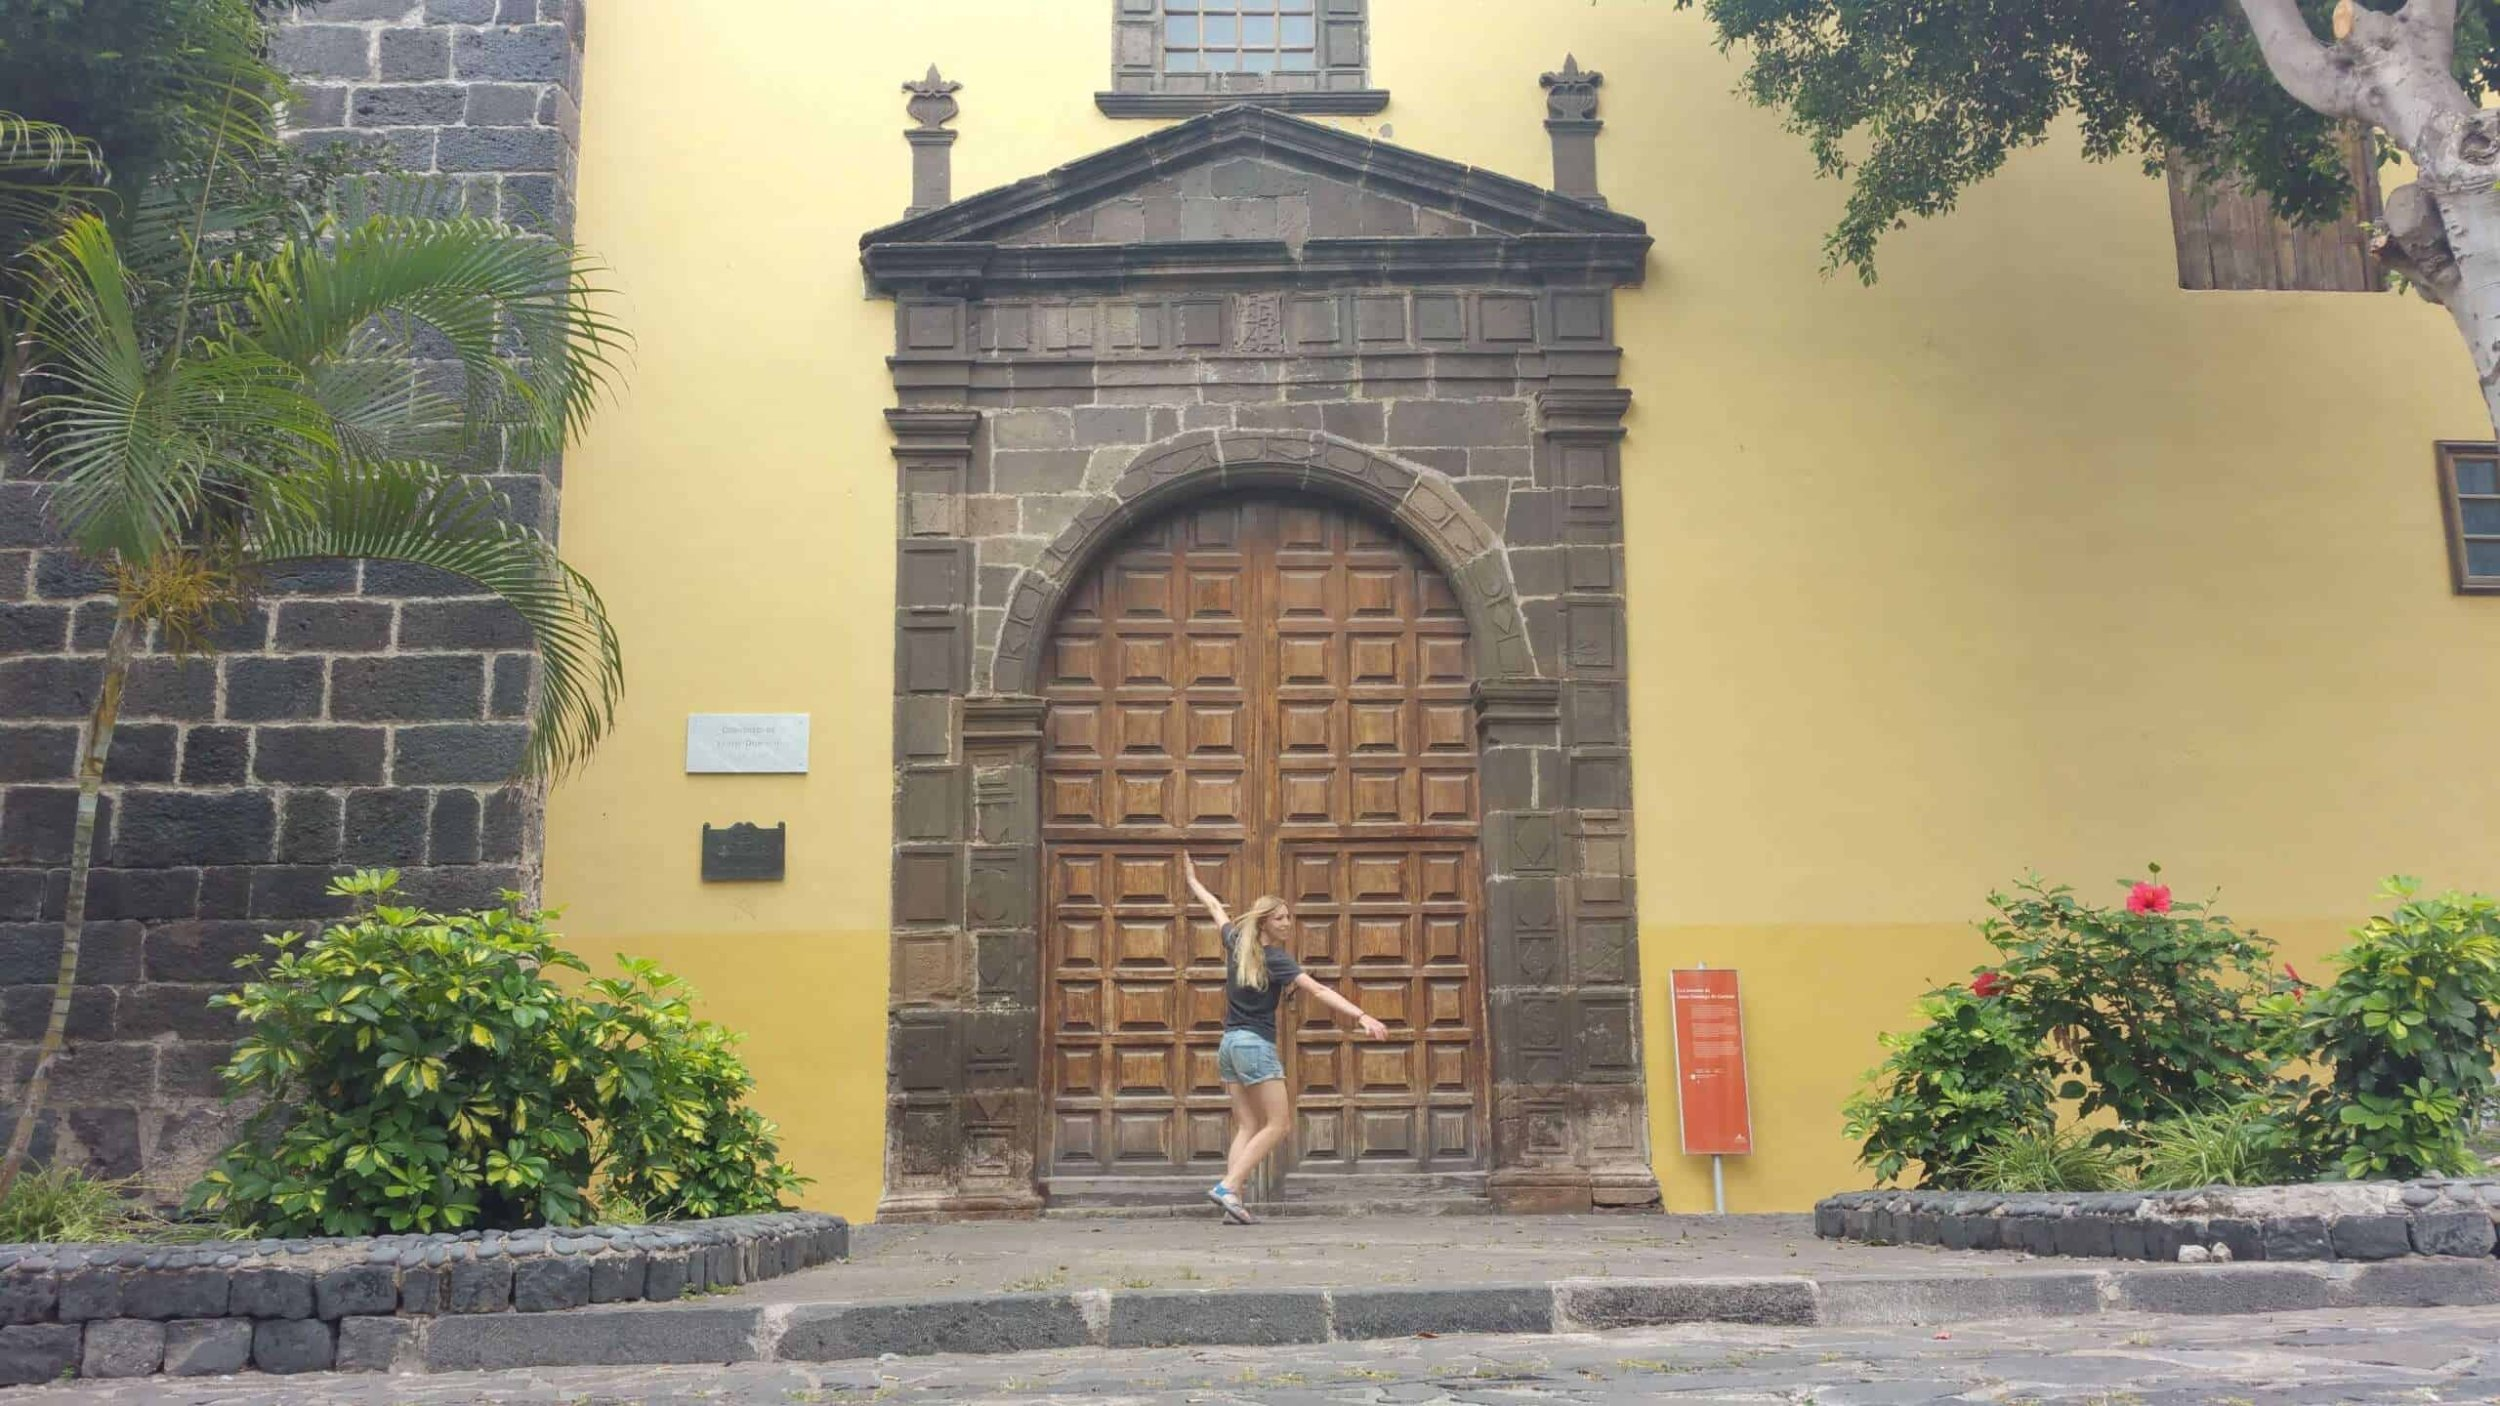 icod-de-los-vinos-garachico-tenerife-teneriffa-canary-islands-canarias-arquitectura-architecture-comer-visit-restaurant-food-canarian-drago-tree-arbol-visitar-turismo-tourism-scaled